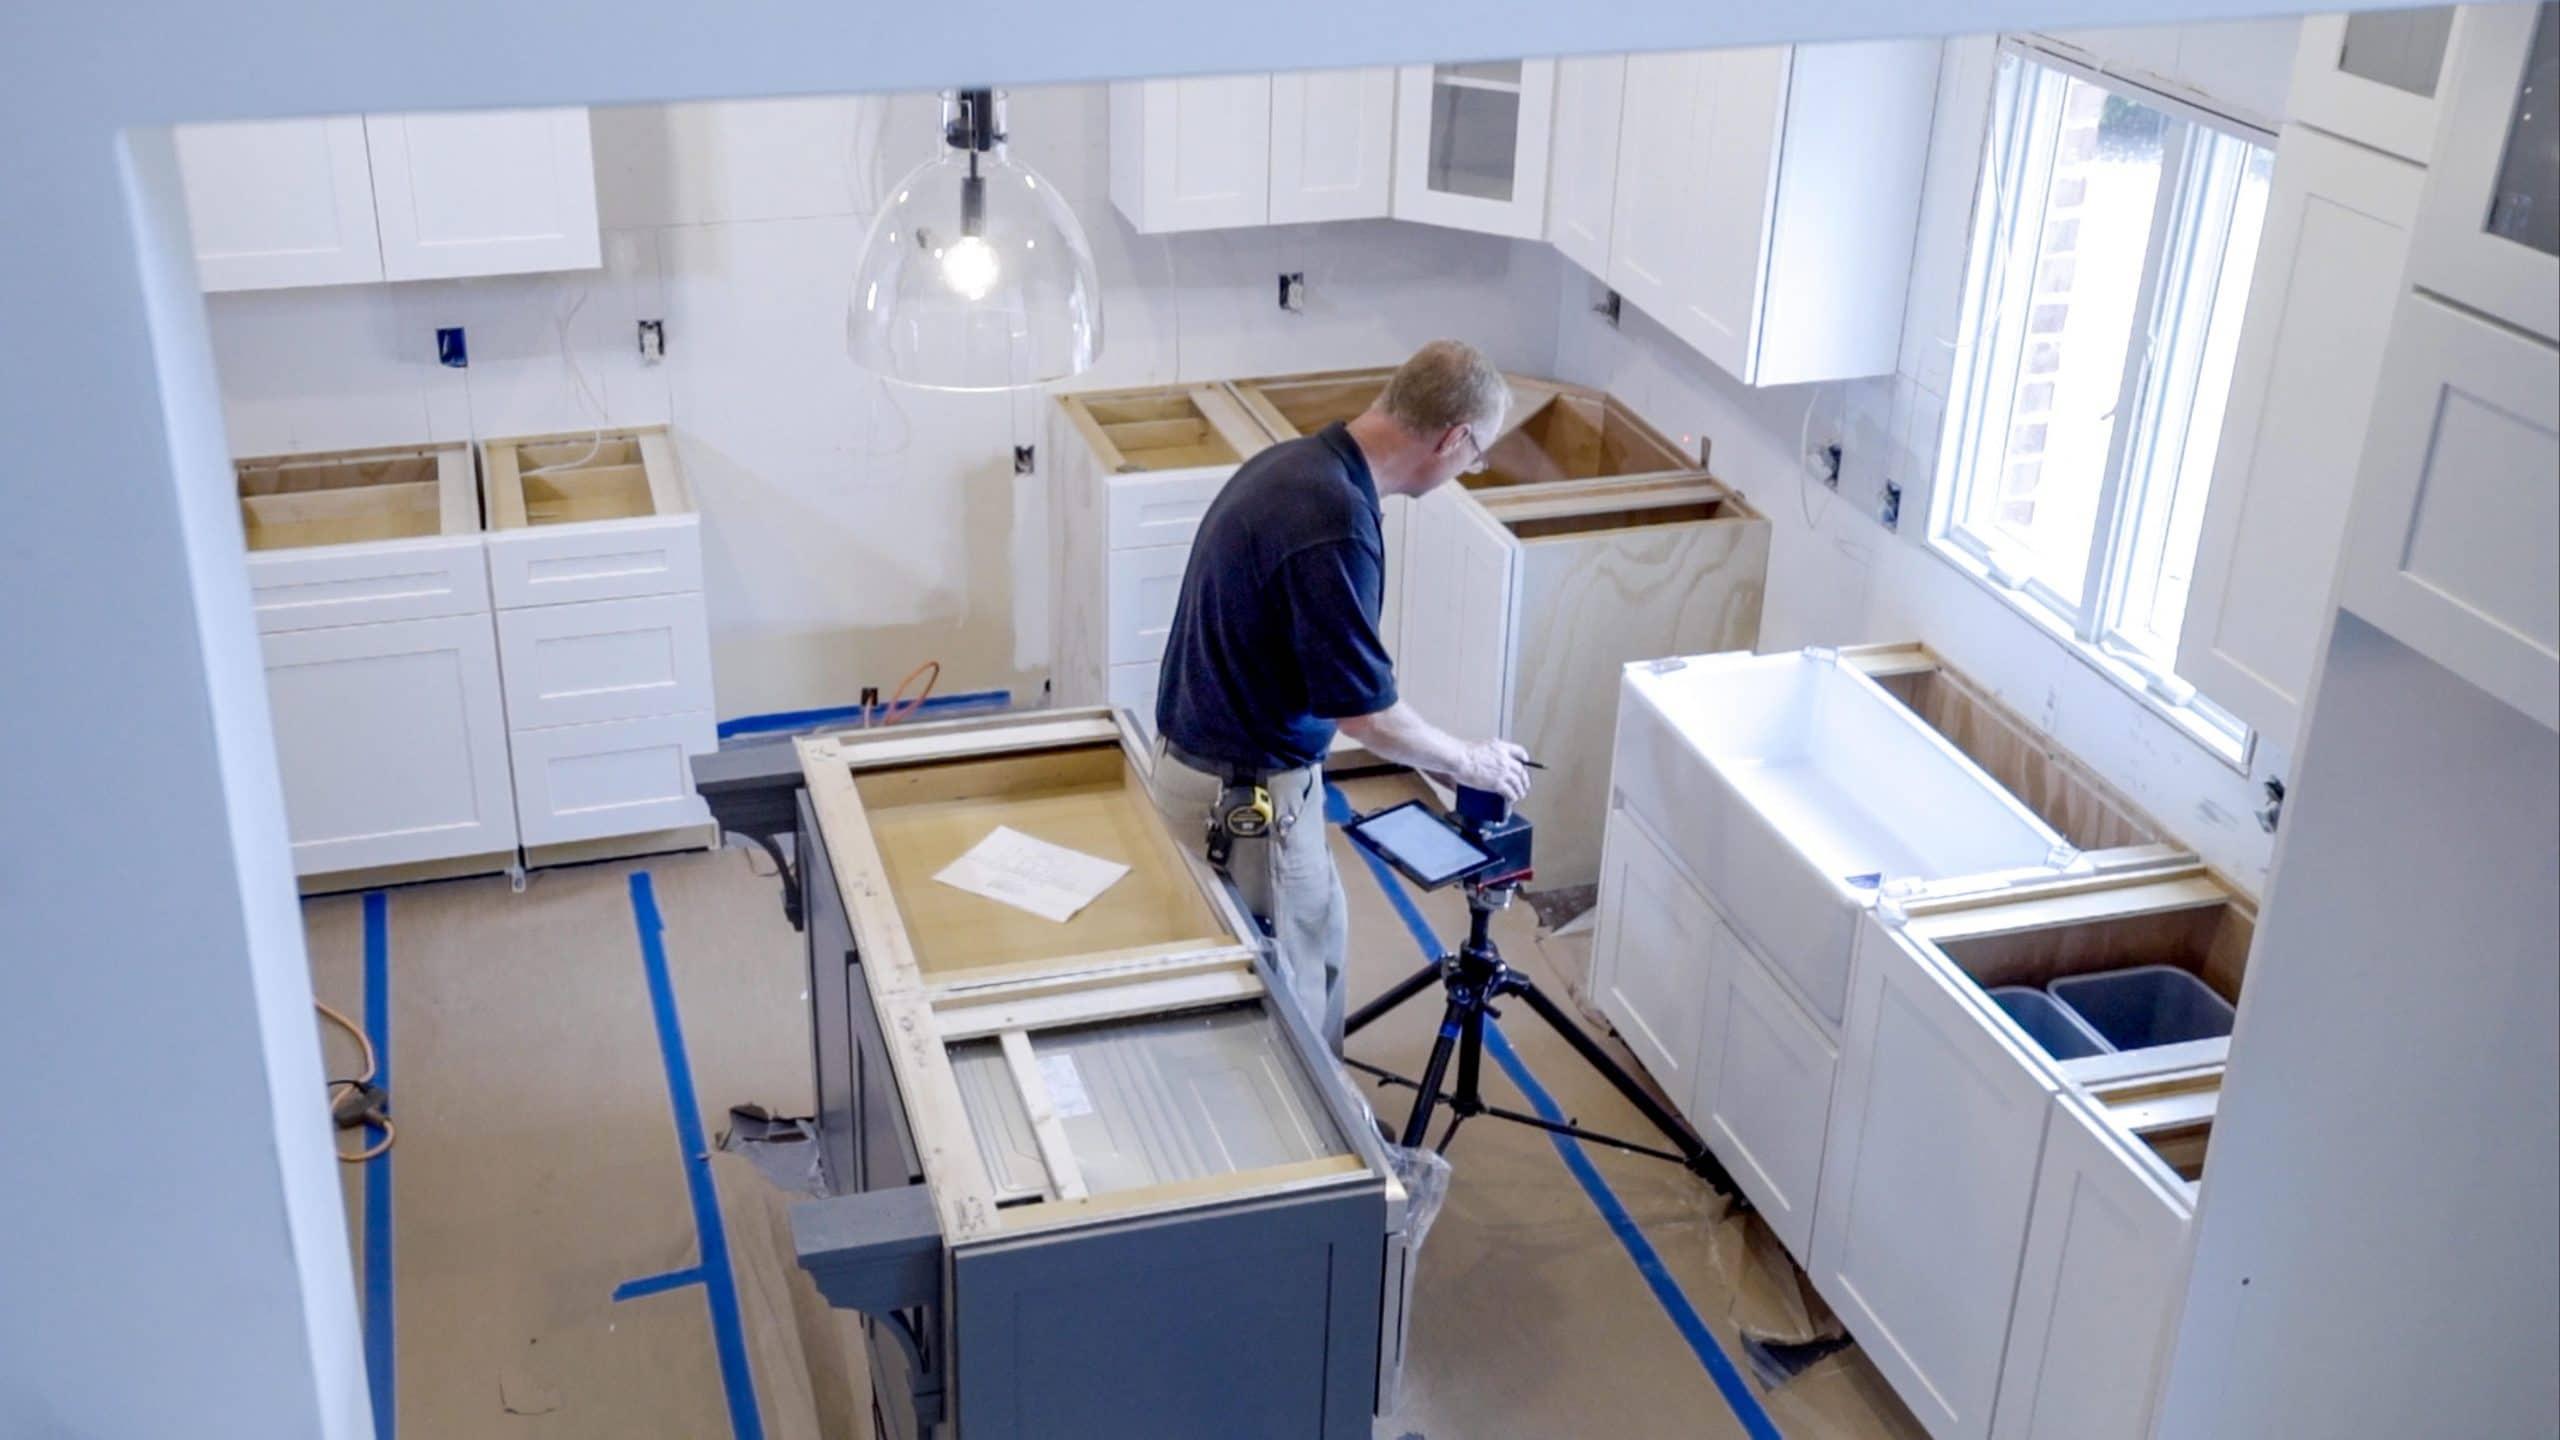 man installing countertops